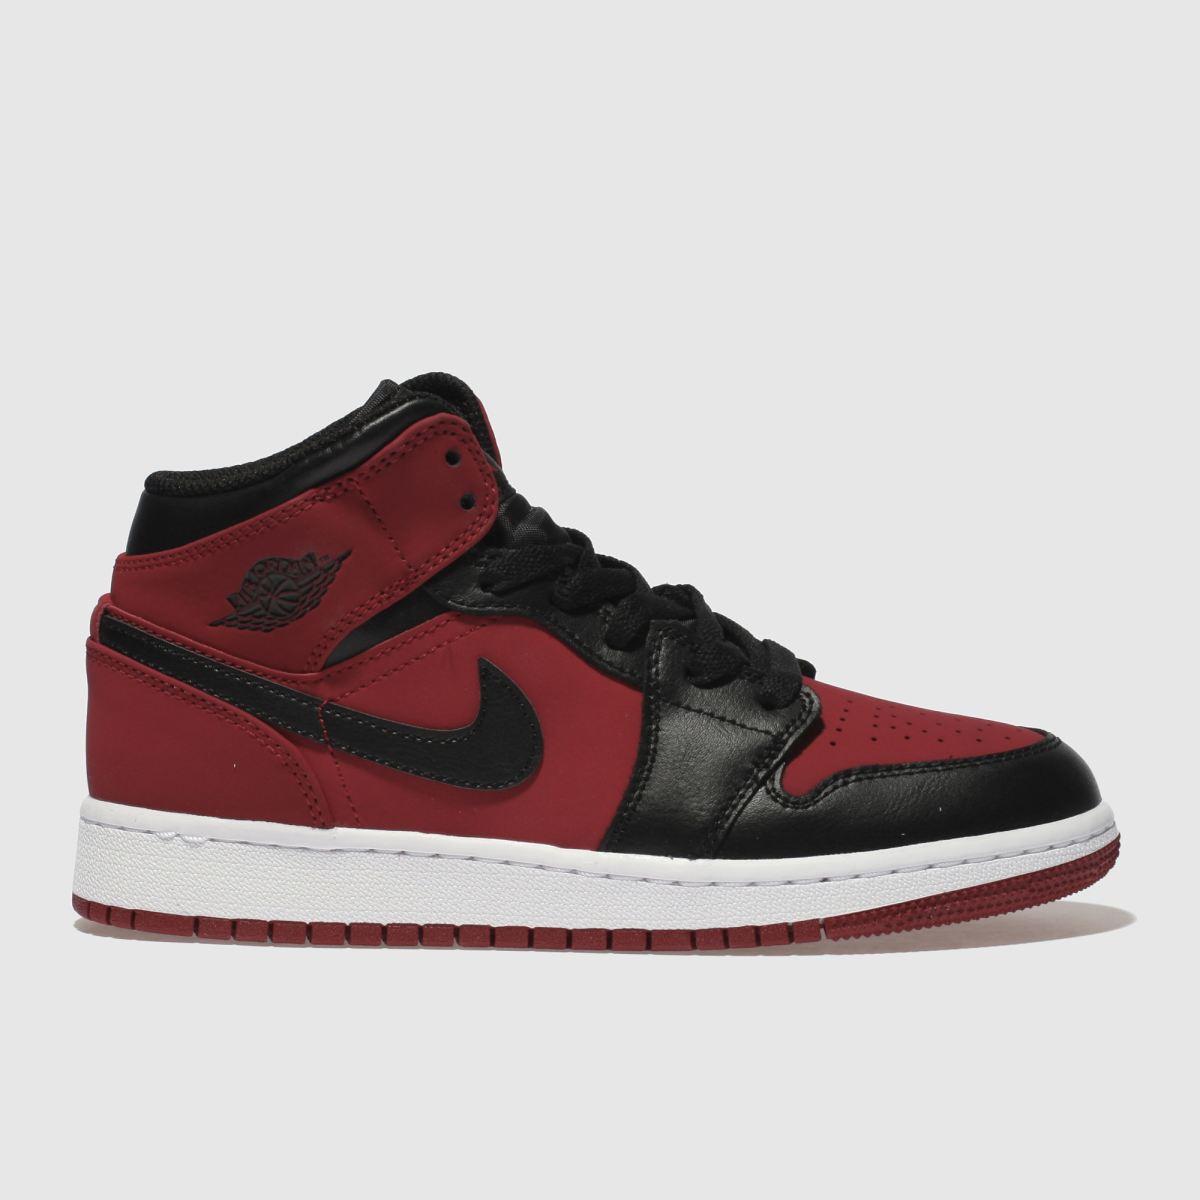 Nike Jordan Black & Red Jordan 1 Mid Youth Trainers